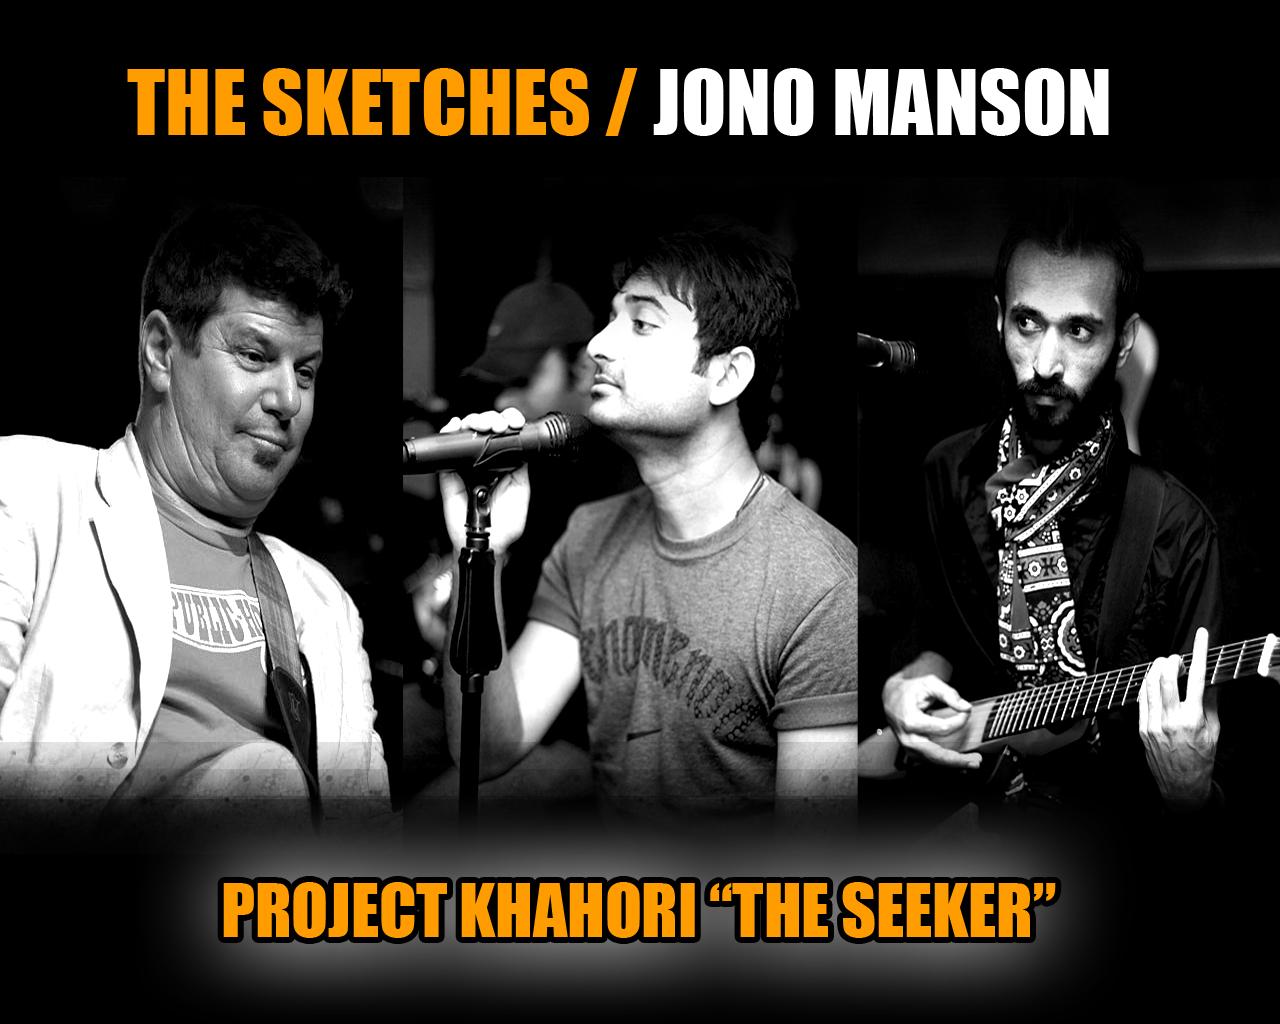 The Sketches Jono Manson Khahori Full Song